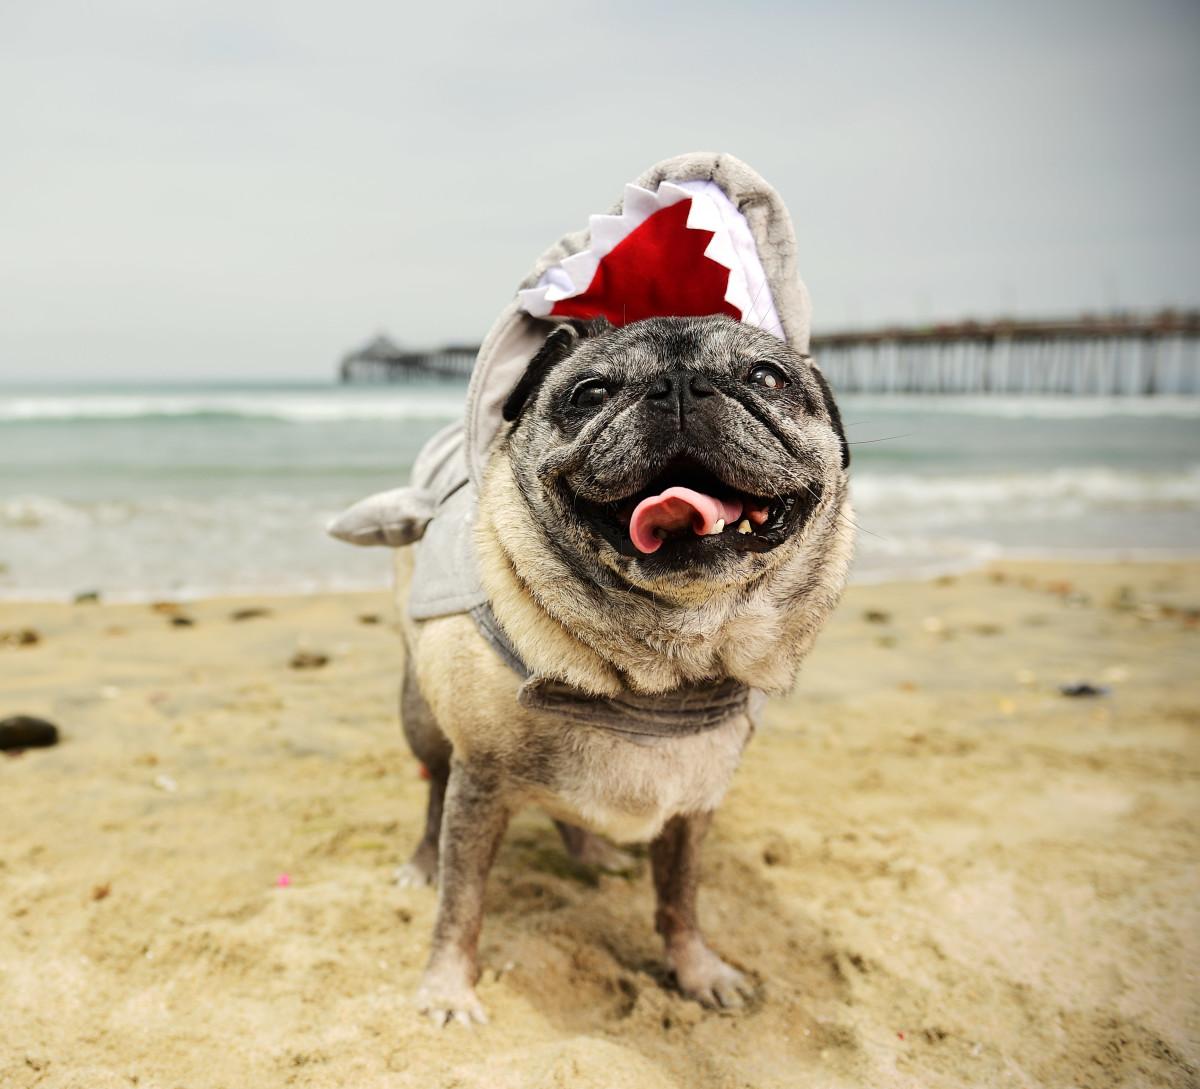 Surfing_Dogs_Gallery_022.jpg